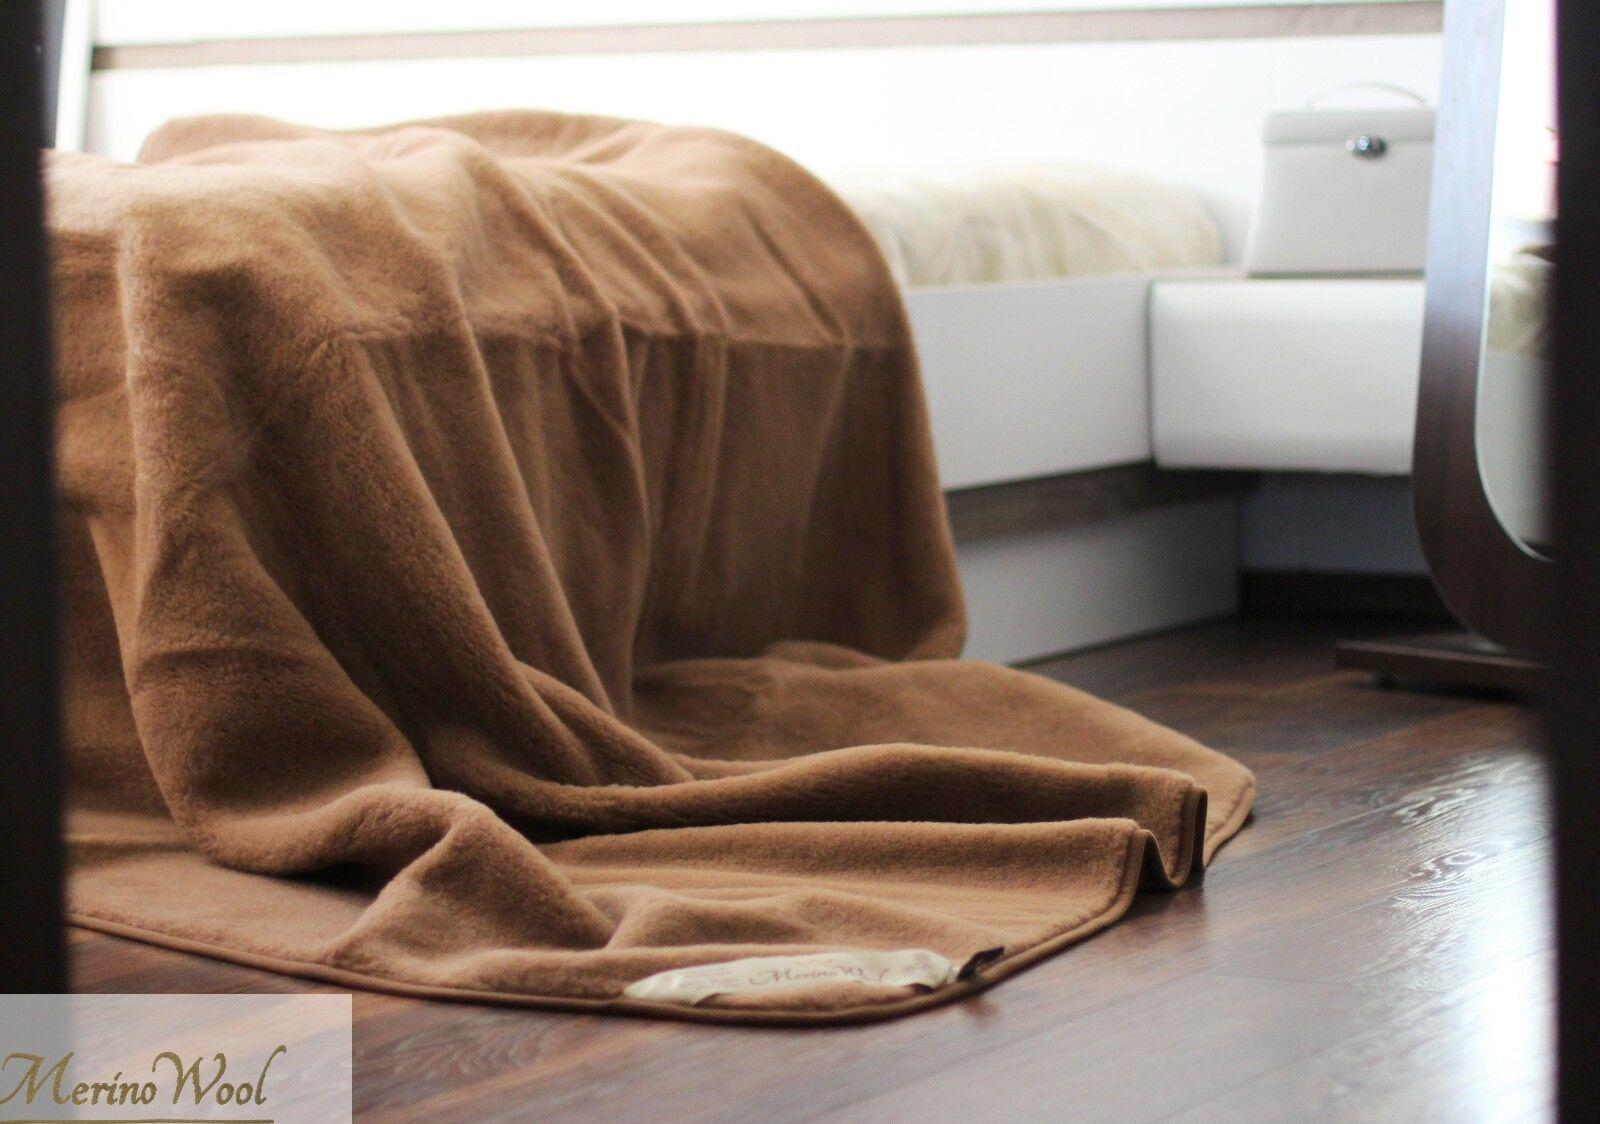 NEW LUXURY 100% Merino Wool Throw König Camel Blanket 200 200cm Bett braun BLANKET